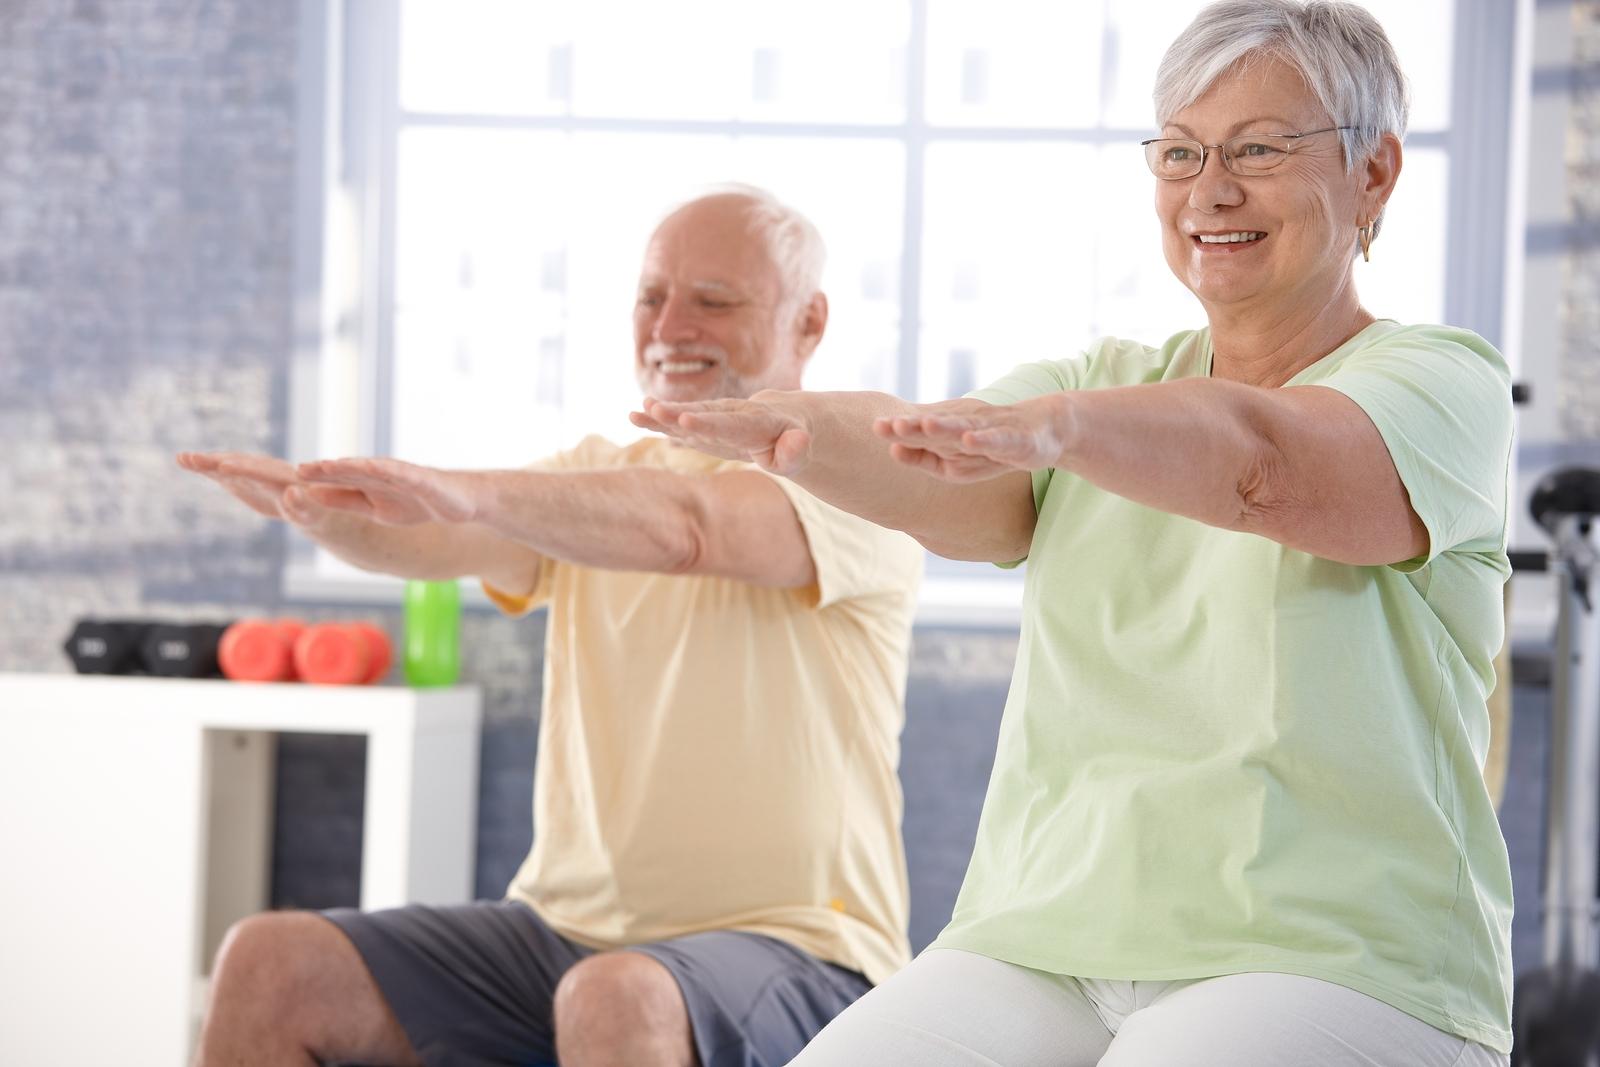 bigstock-Mature-people-exercising-happi-32925062